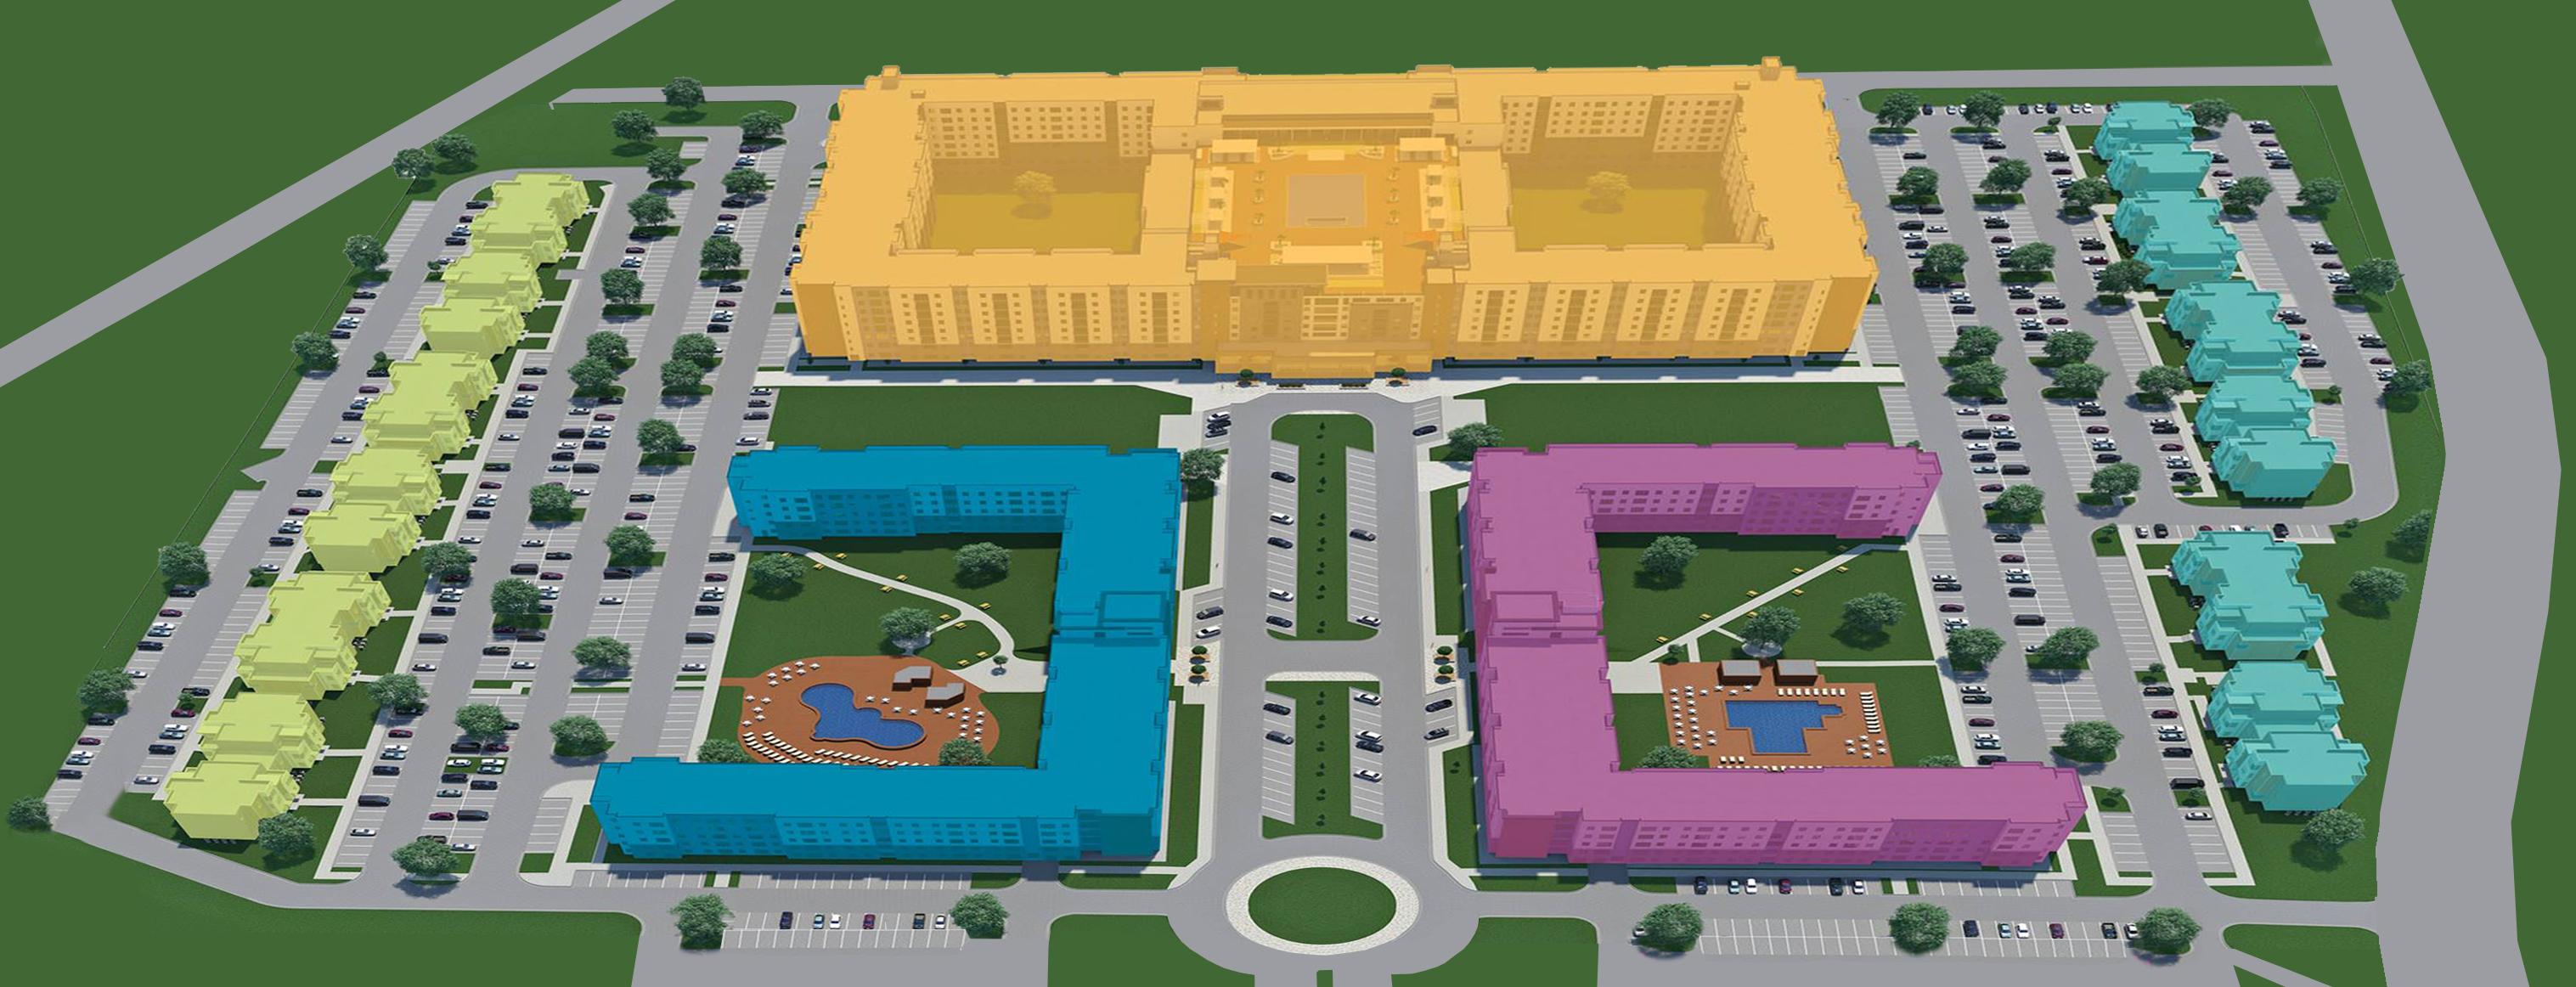 Park West student housing site plan rendering